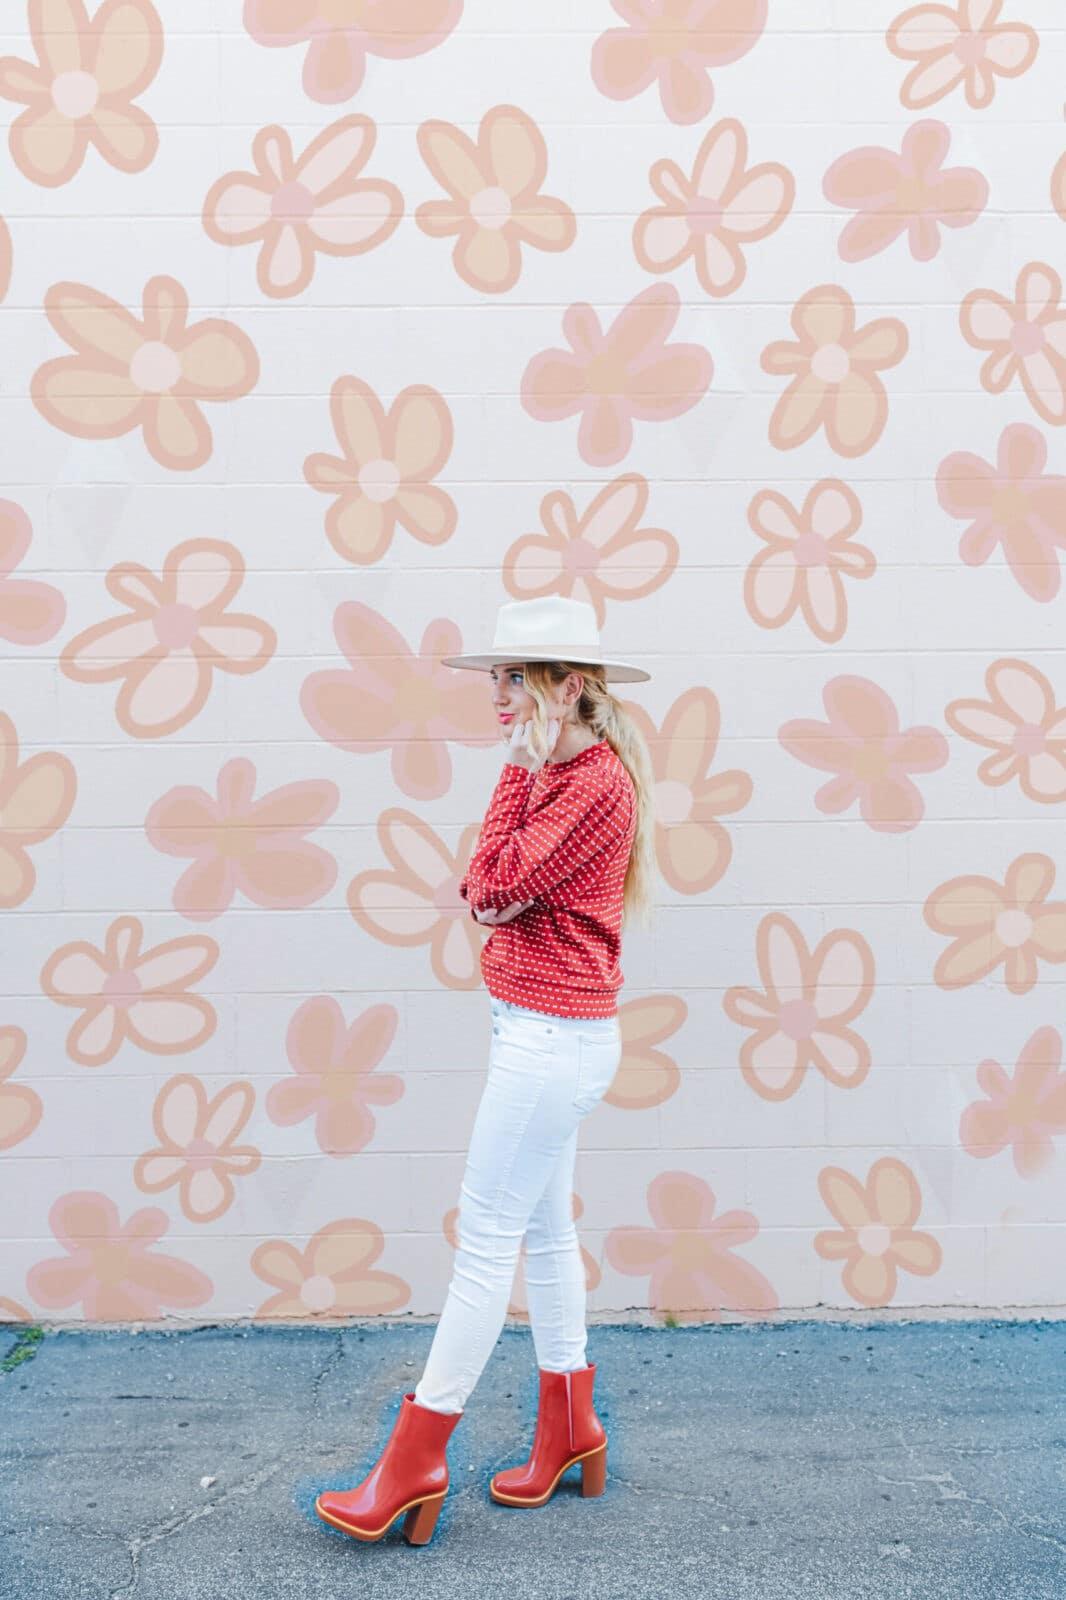 PicsArt Flower Wall